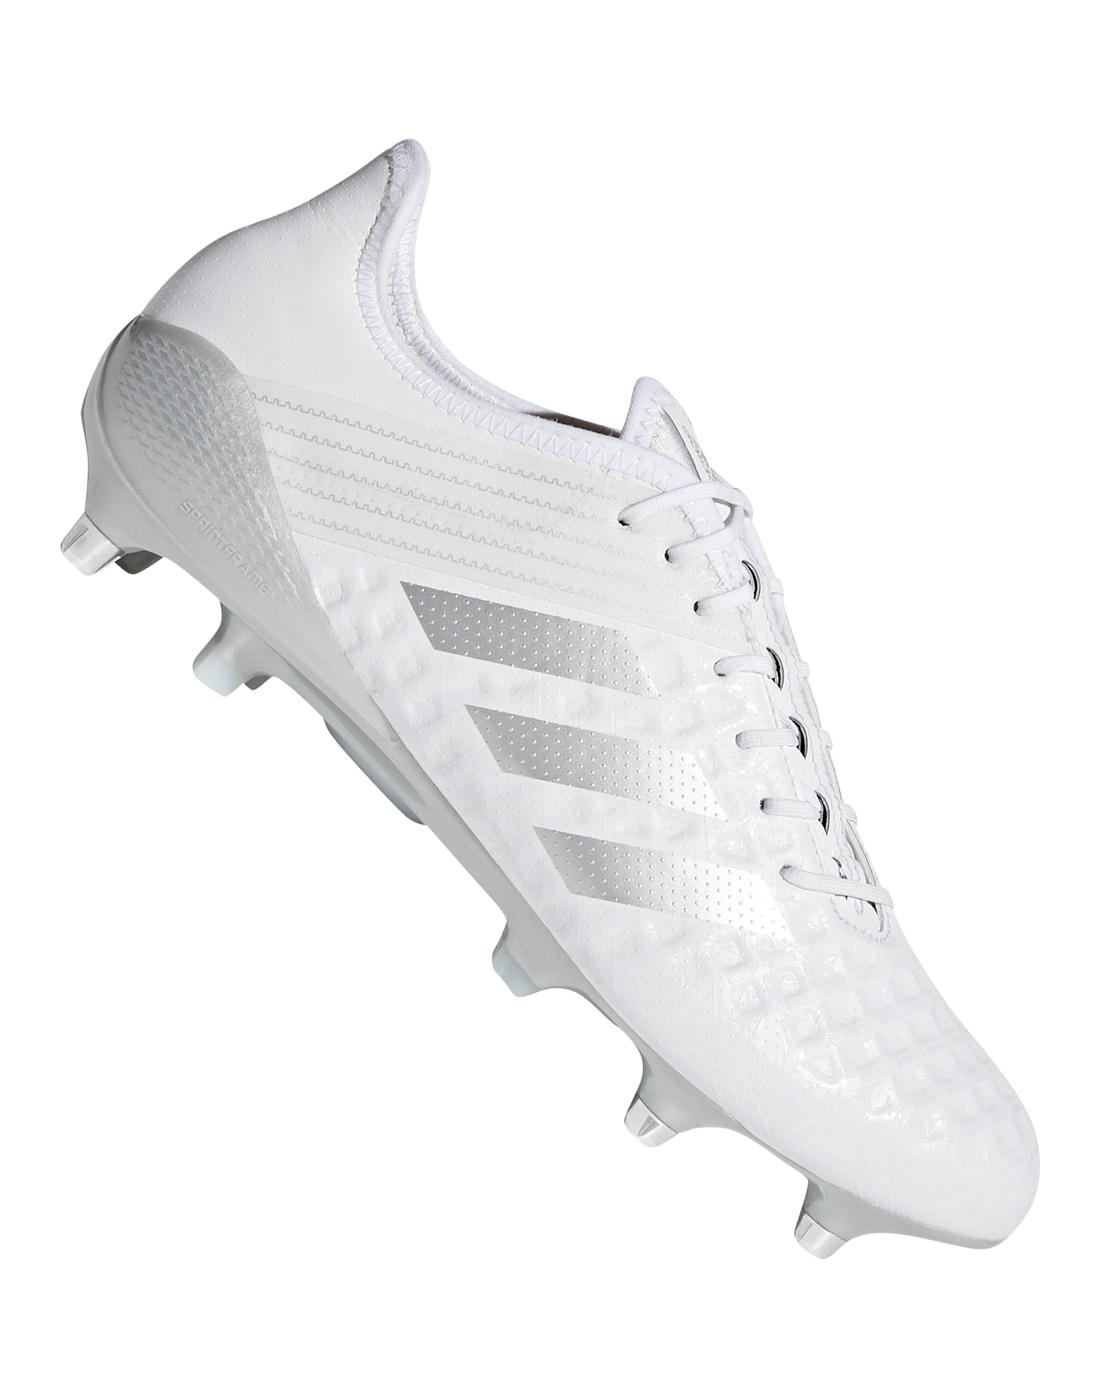 adidas predator malice control white